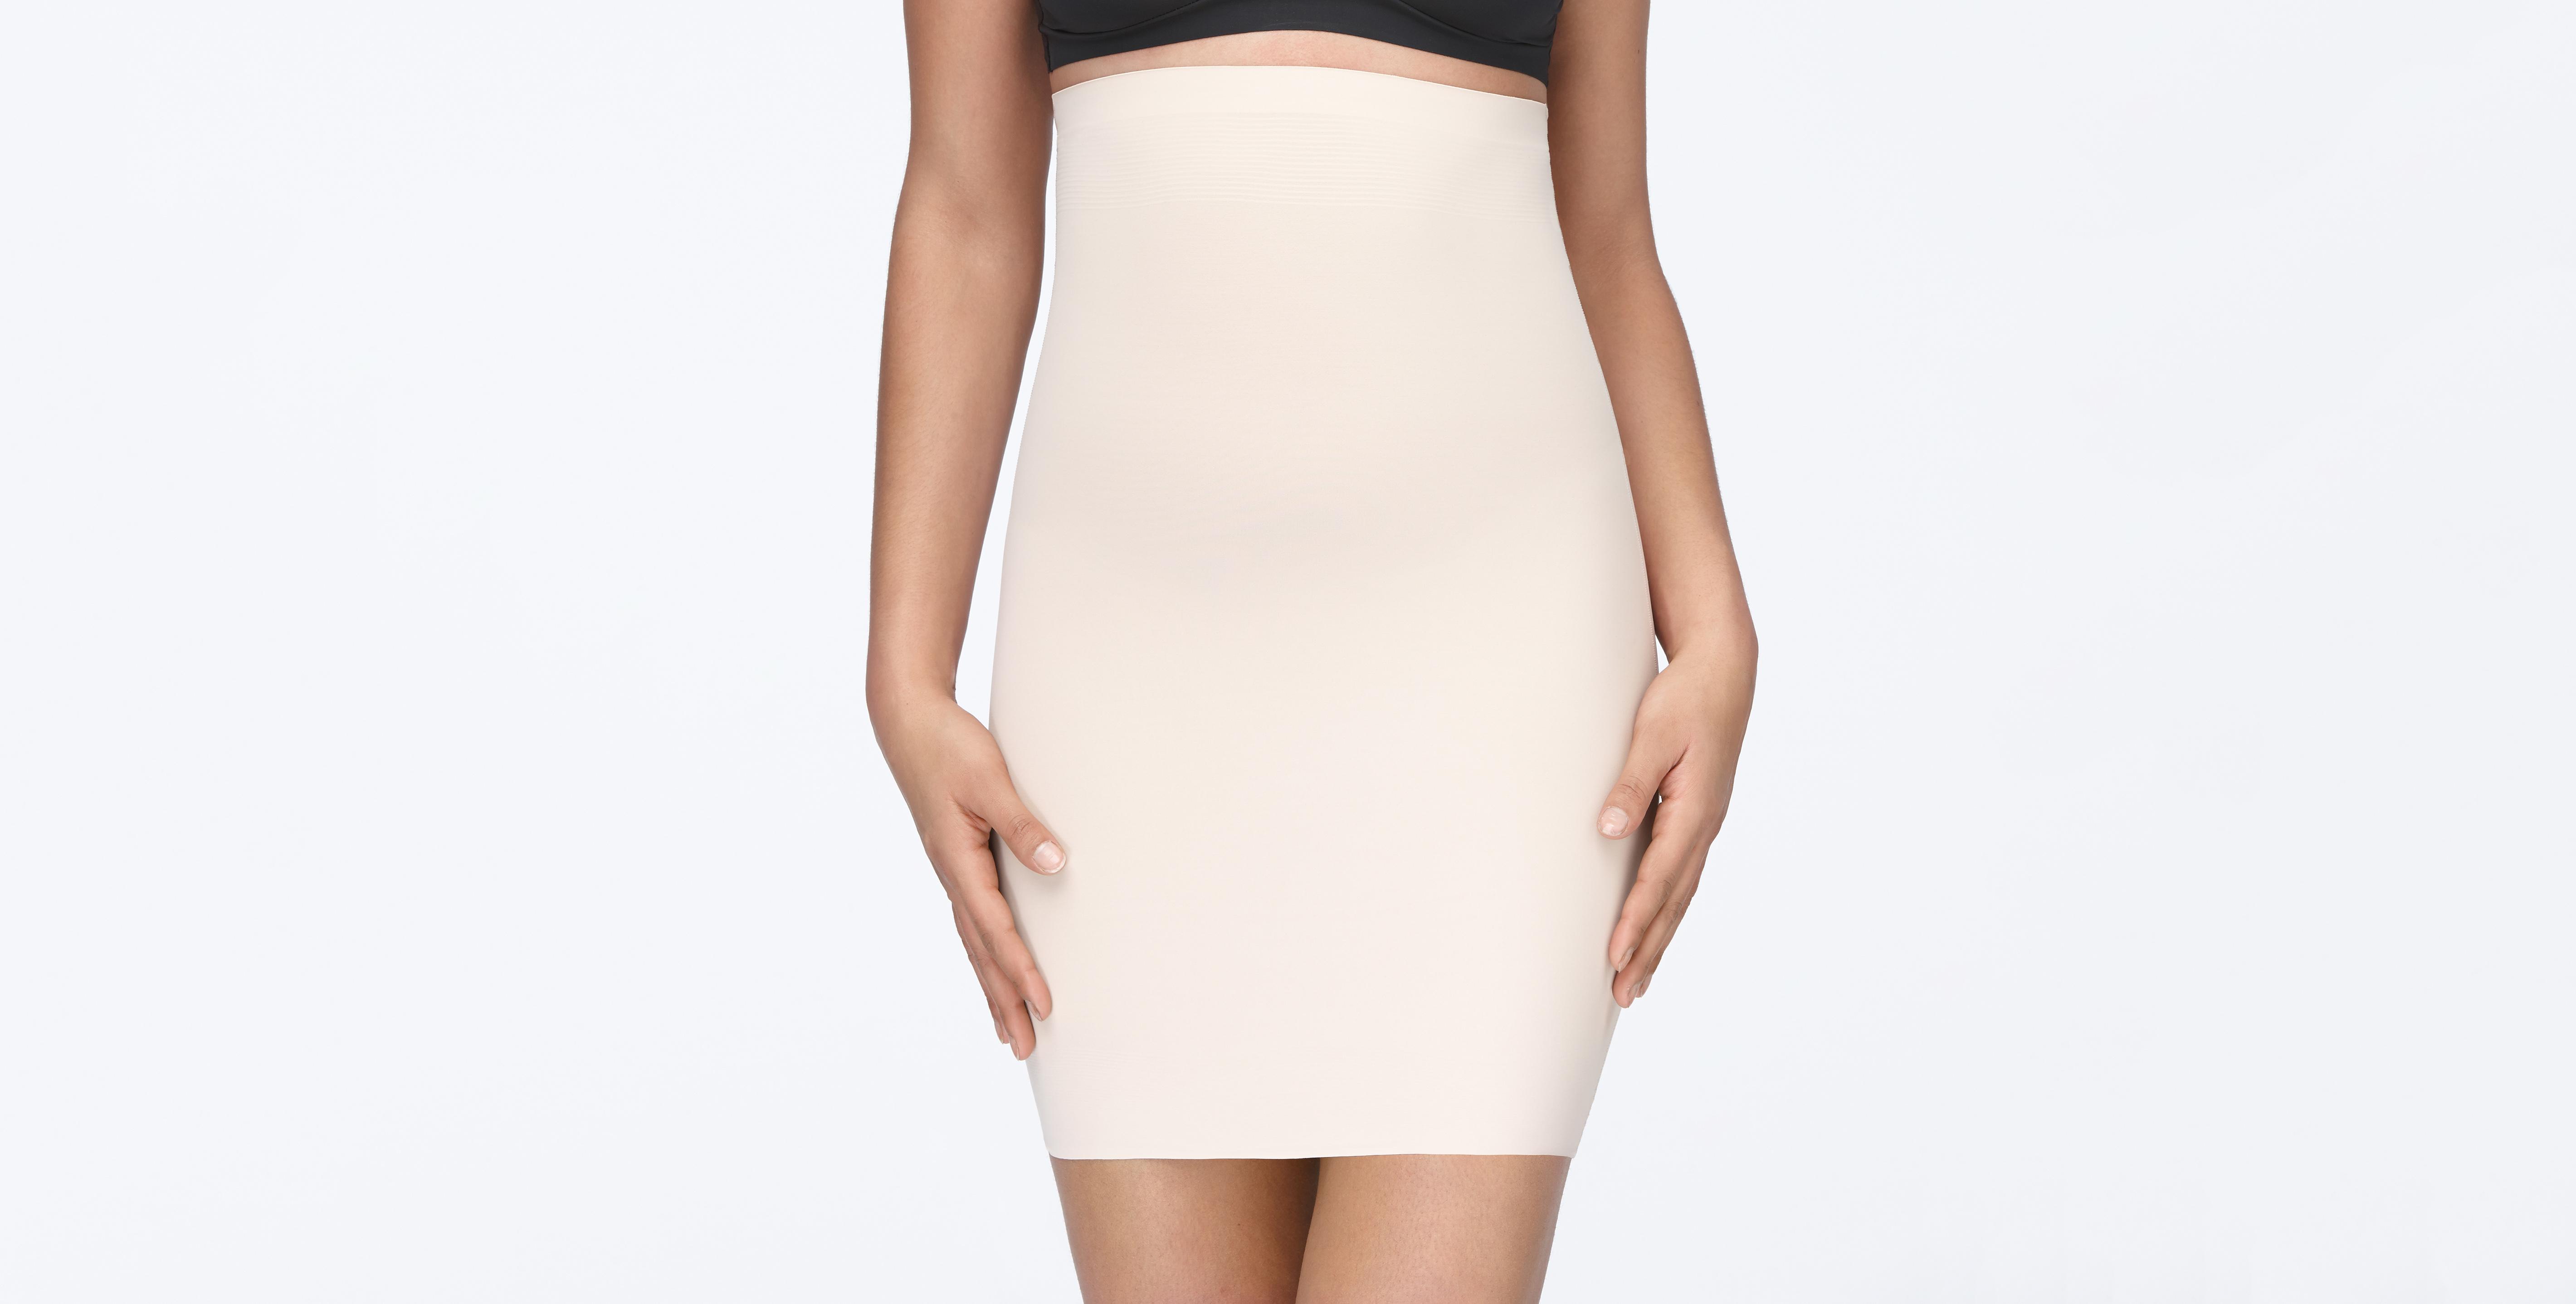 yummie heather thompson yulia skirt slip